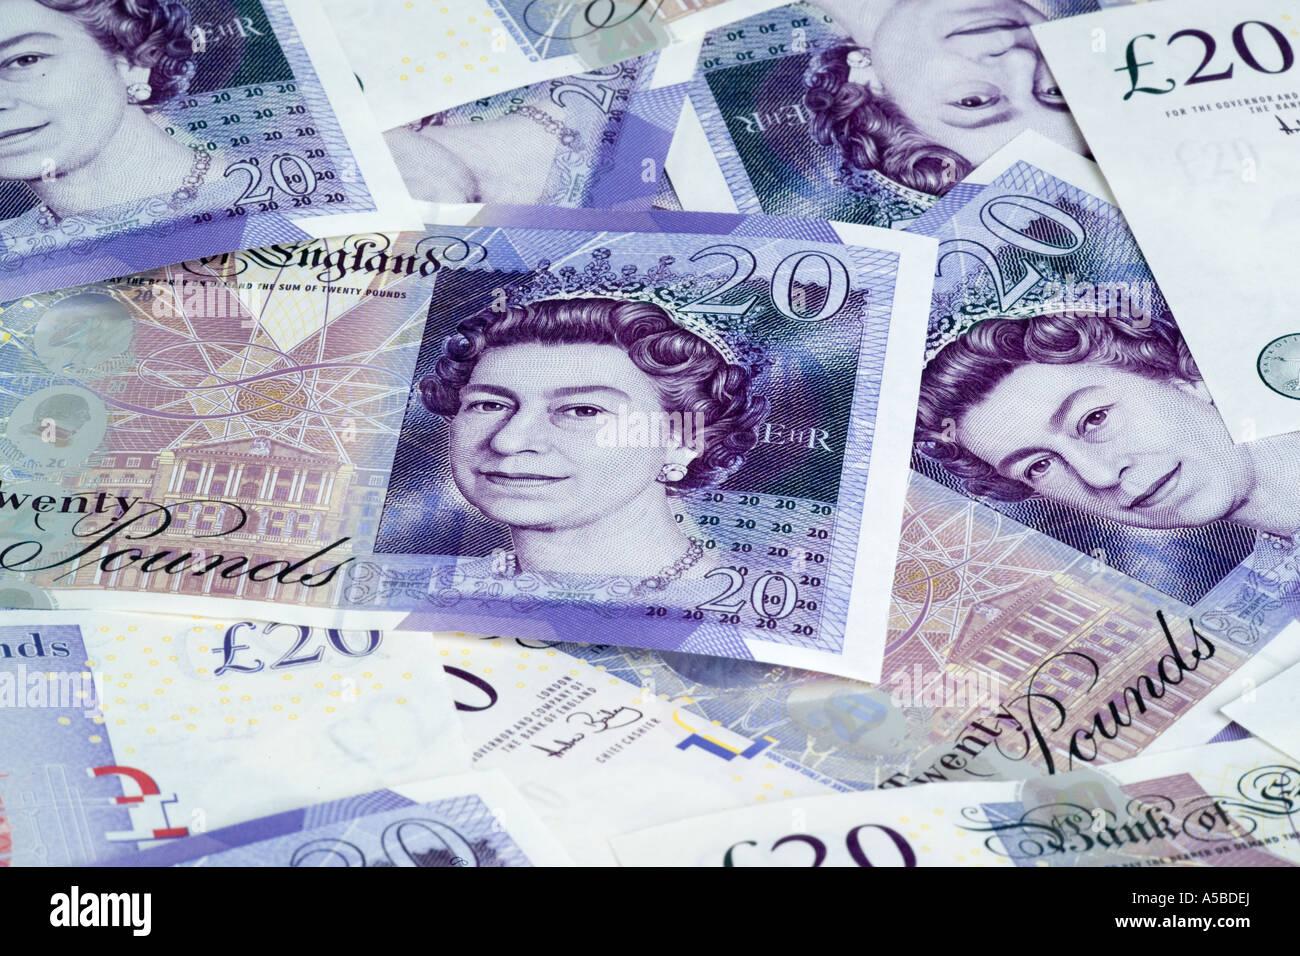 A spread of twenty 20 pound notes new 2007 design - Stock Image